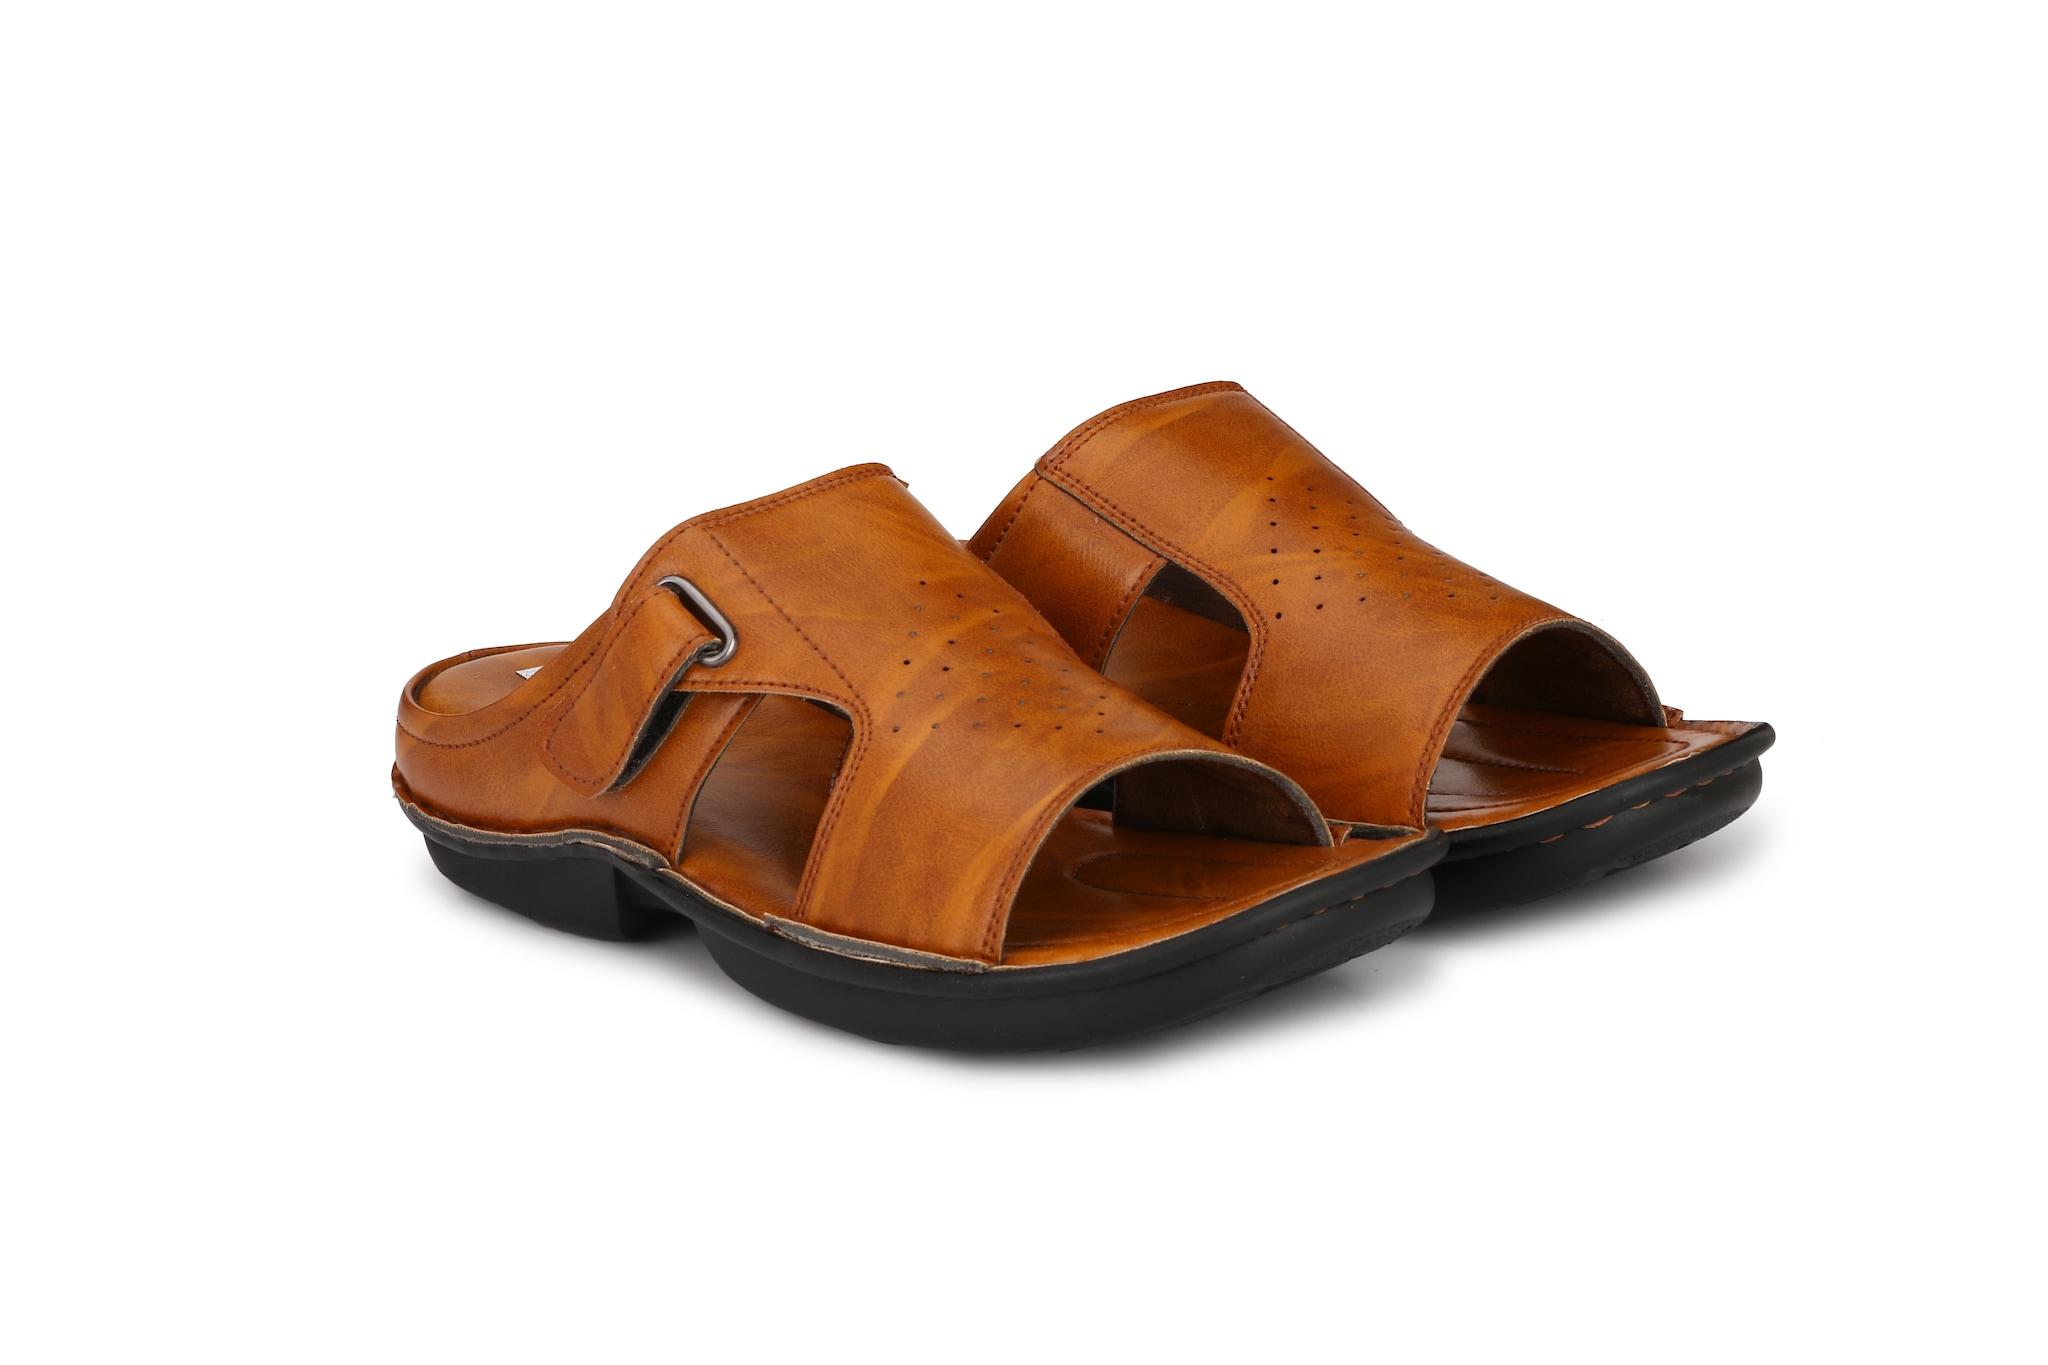 BUCIK Men's Tan Synthetic Leather Casual Sandals BCK074-TAN (Tan,6-10,8 PAIR)